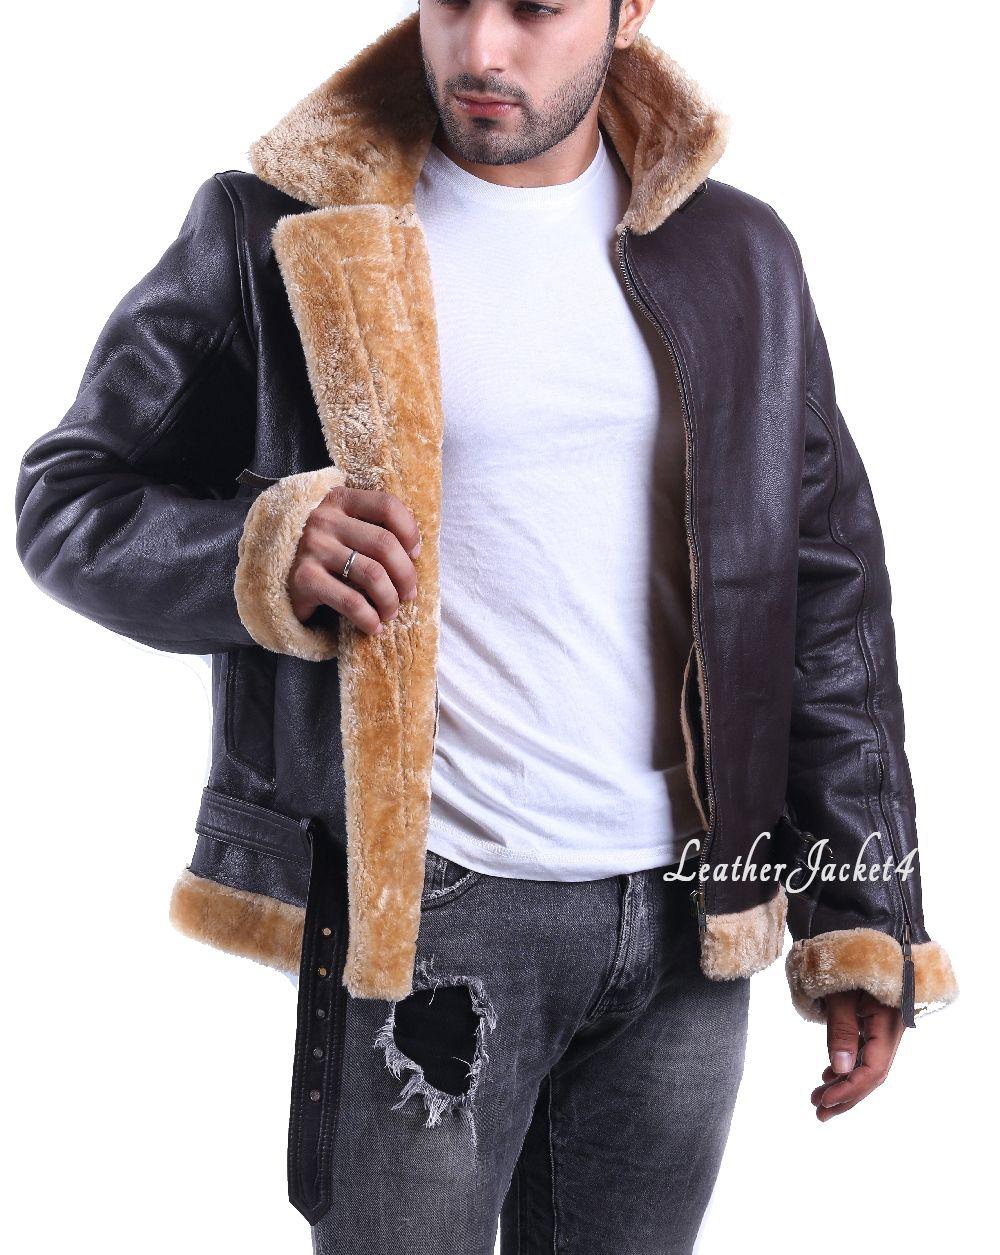 Tom Hardy Jacket Leather Jackets Online Leather Jacket Style Leather Jacket Men [ 1255 x 1000 Pixel ]